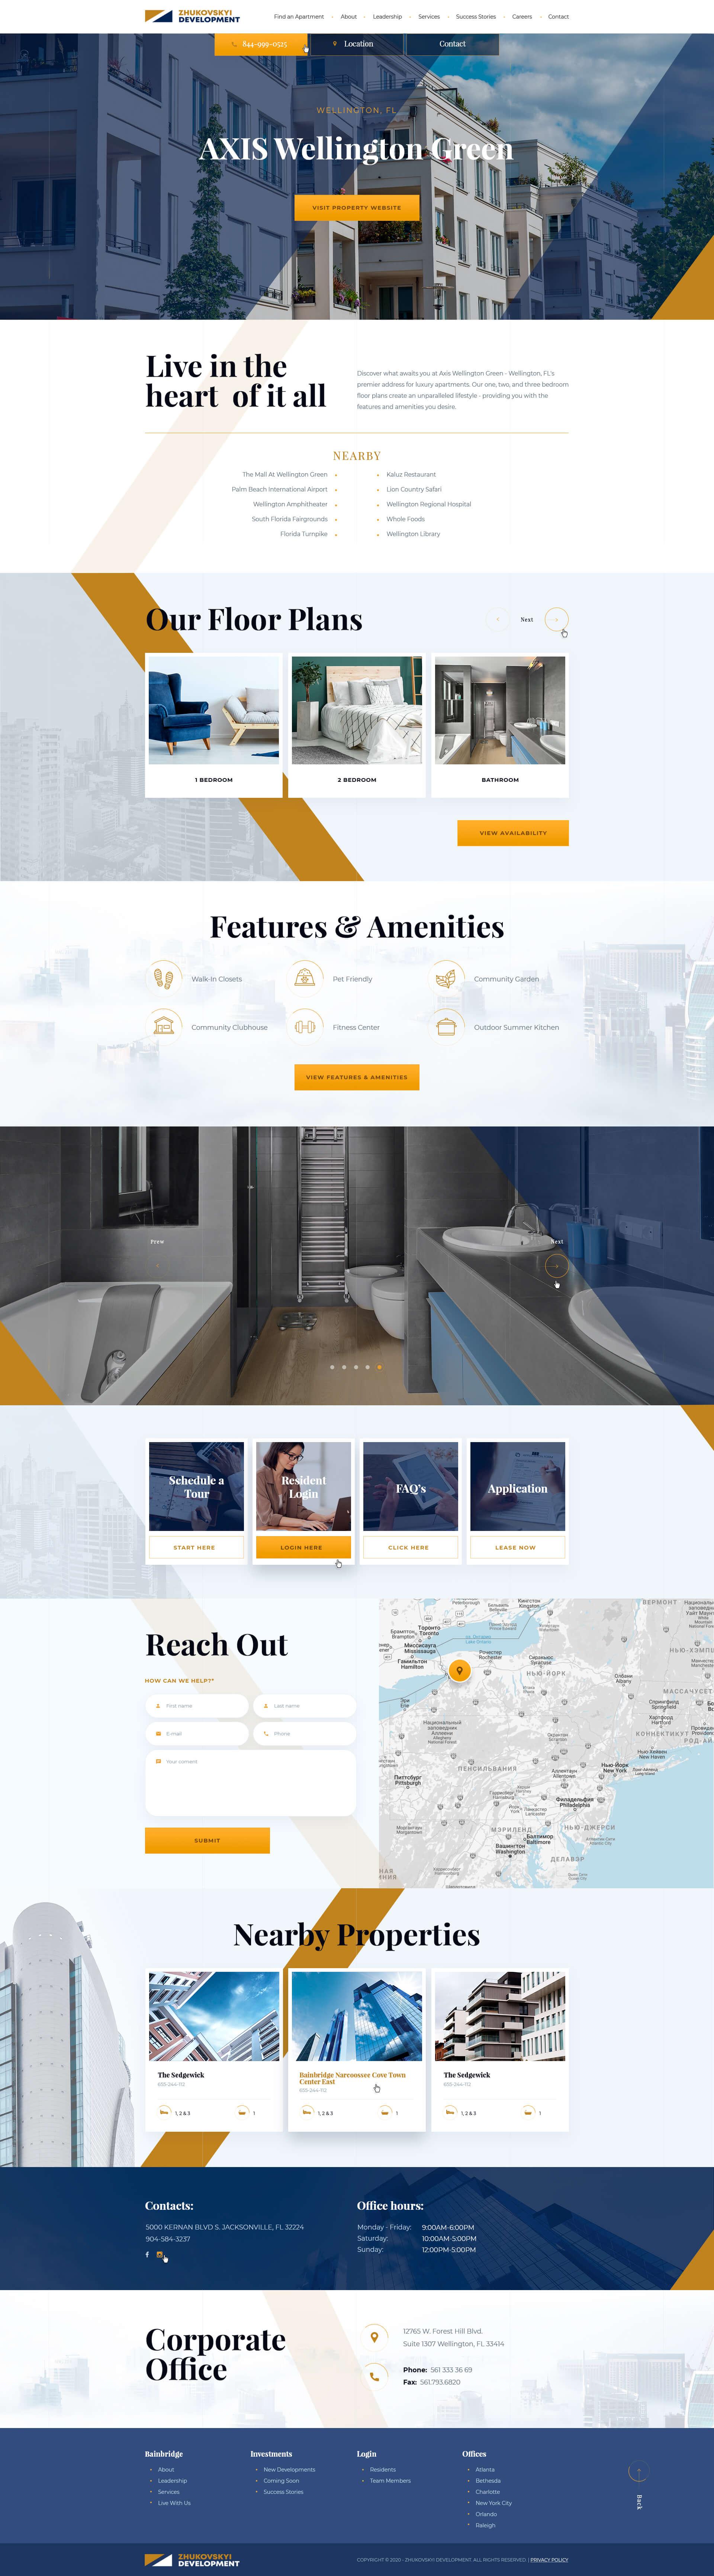 03_Zhukovskyi Development_Apartment page_0.1